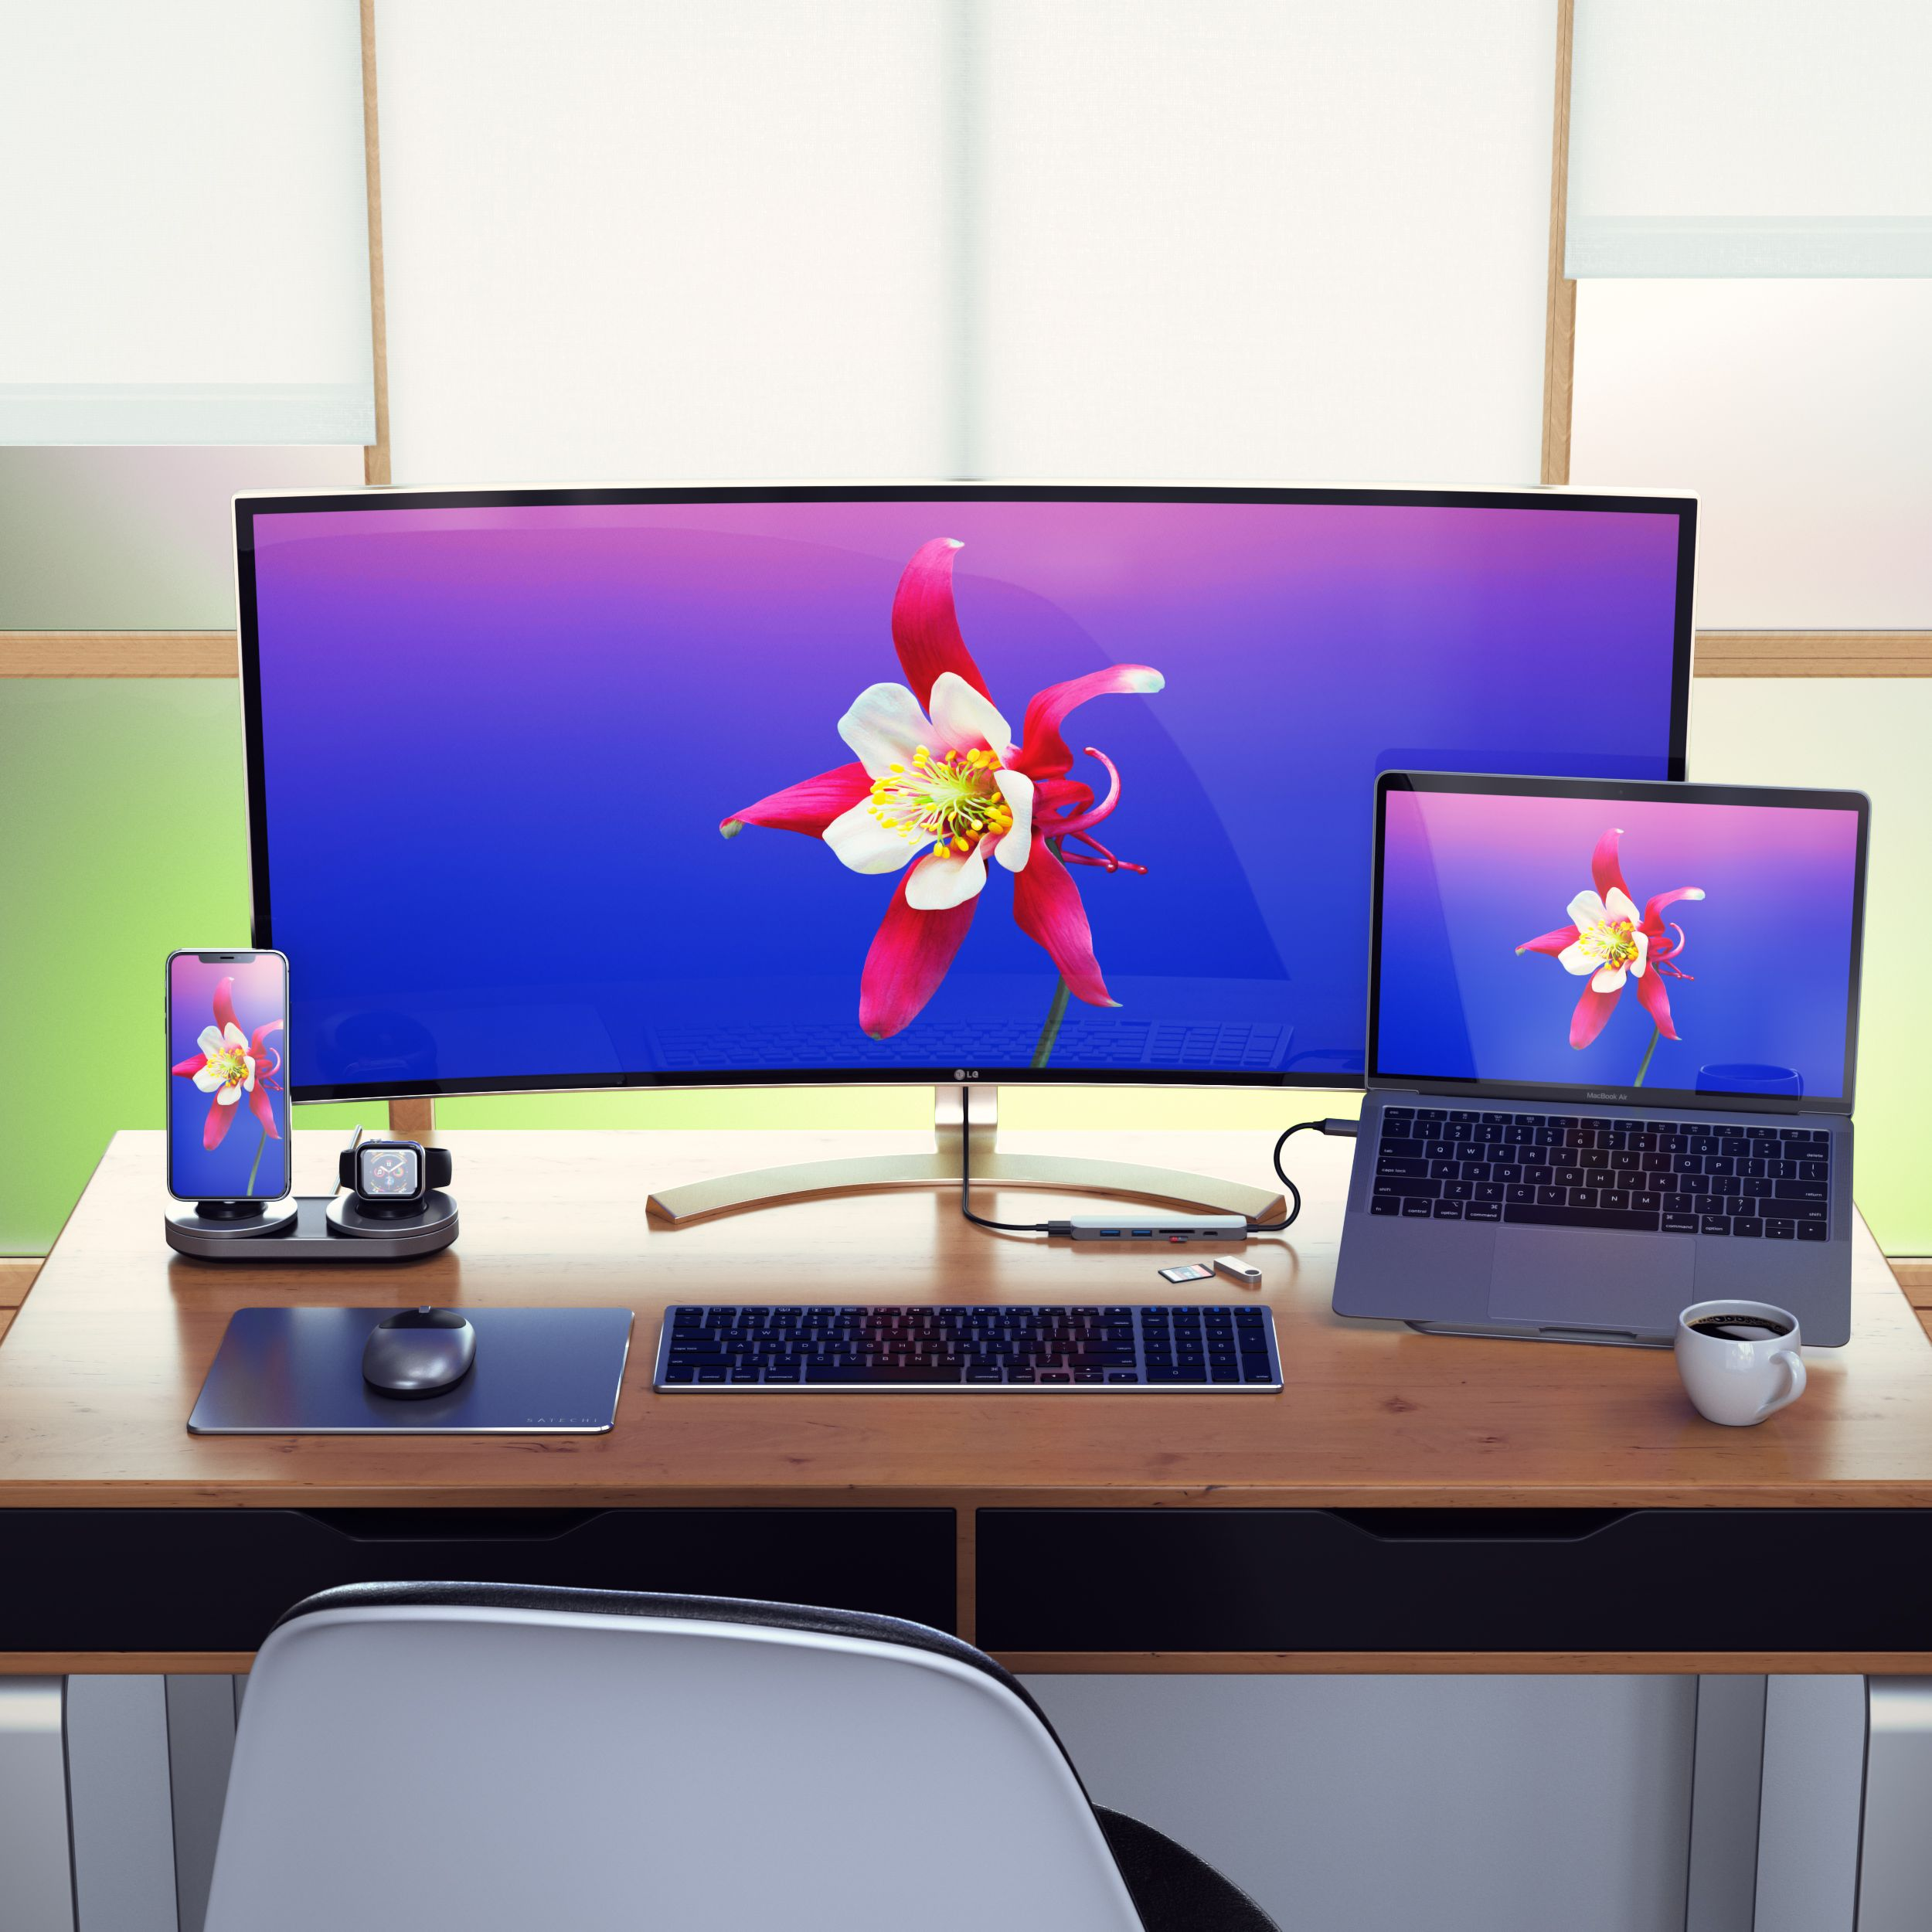 Satechi Memorial Day Sale | Macbook, Macbook pro setup, Pc setup